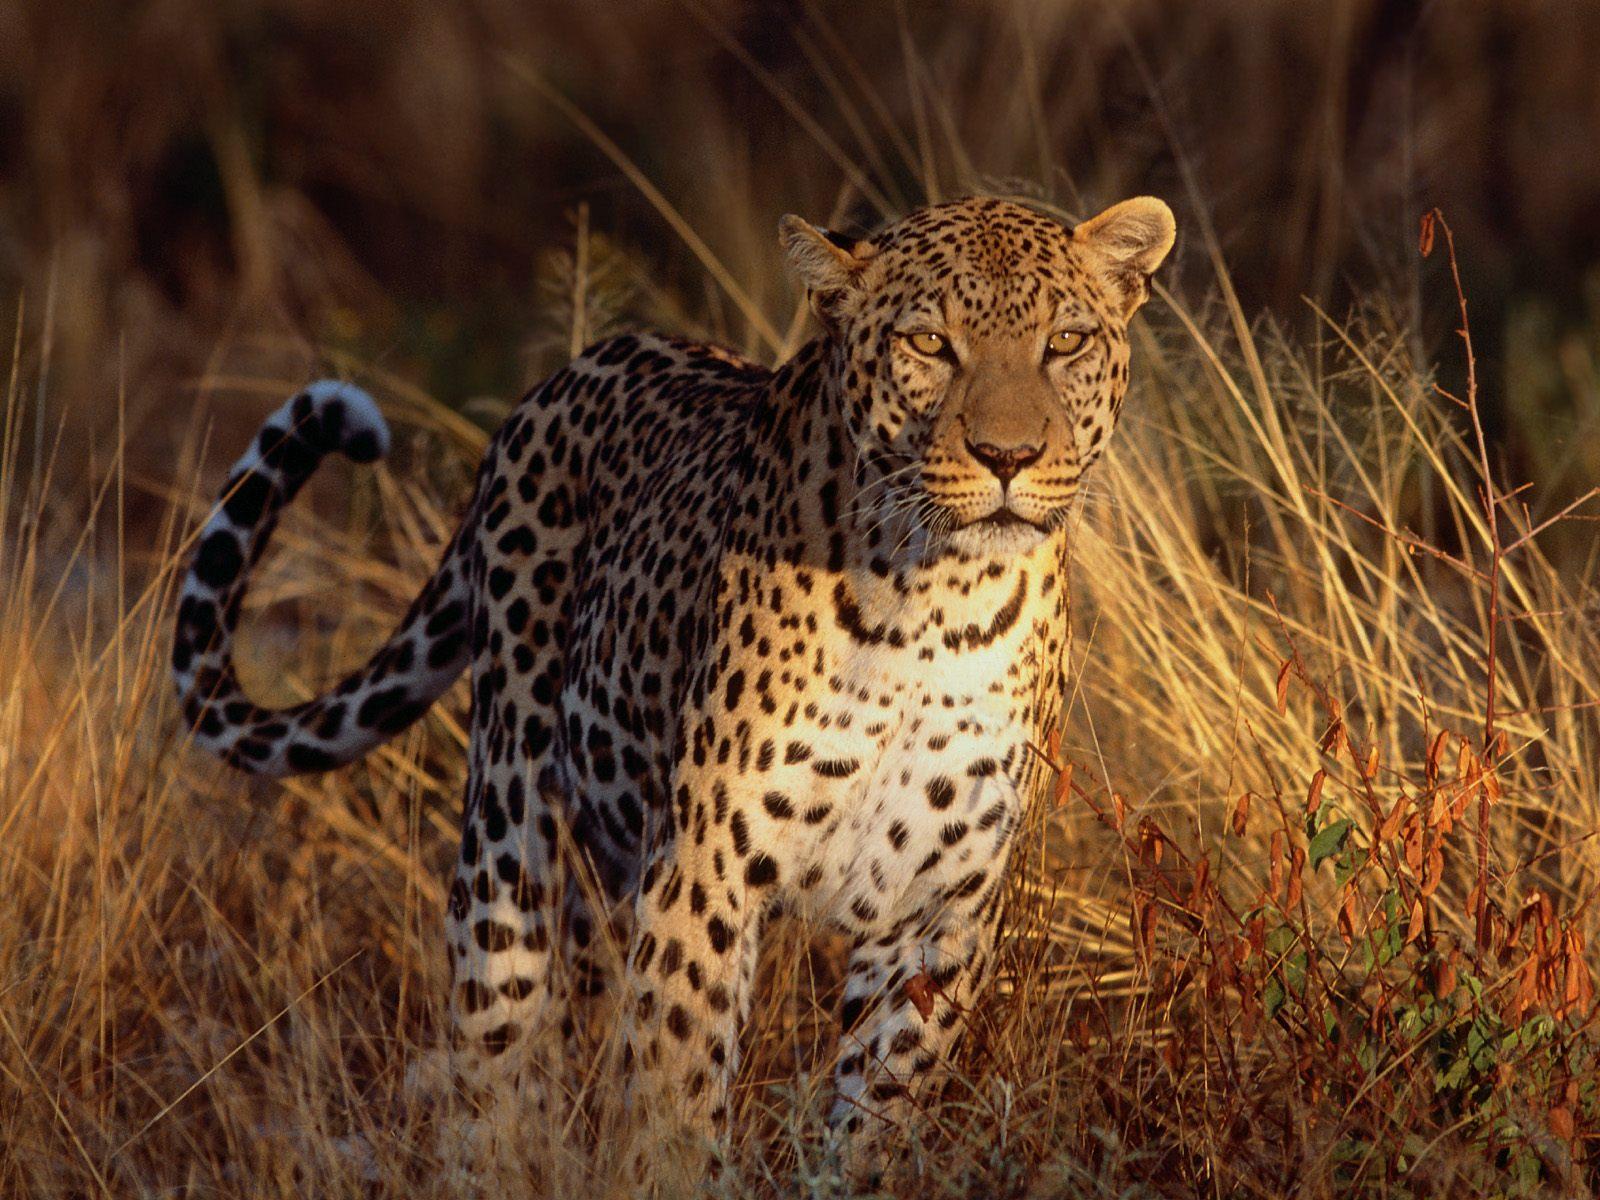 Leopard hd wallpapers   Movies Songs Lyrics